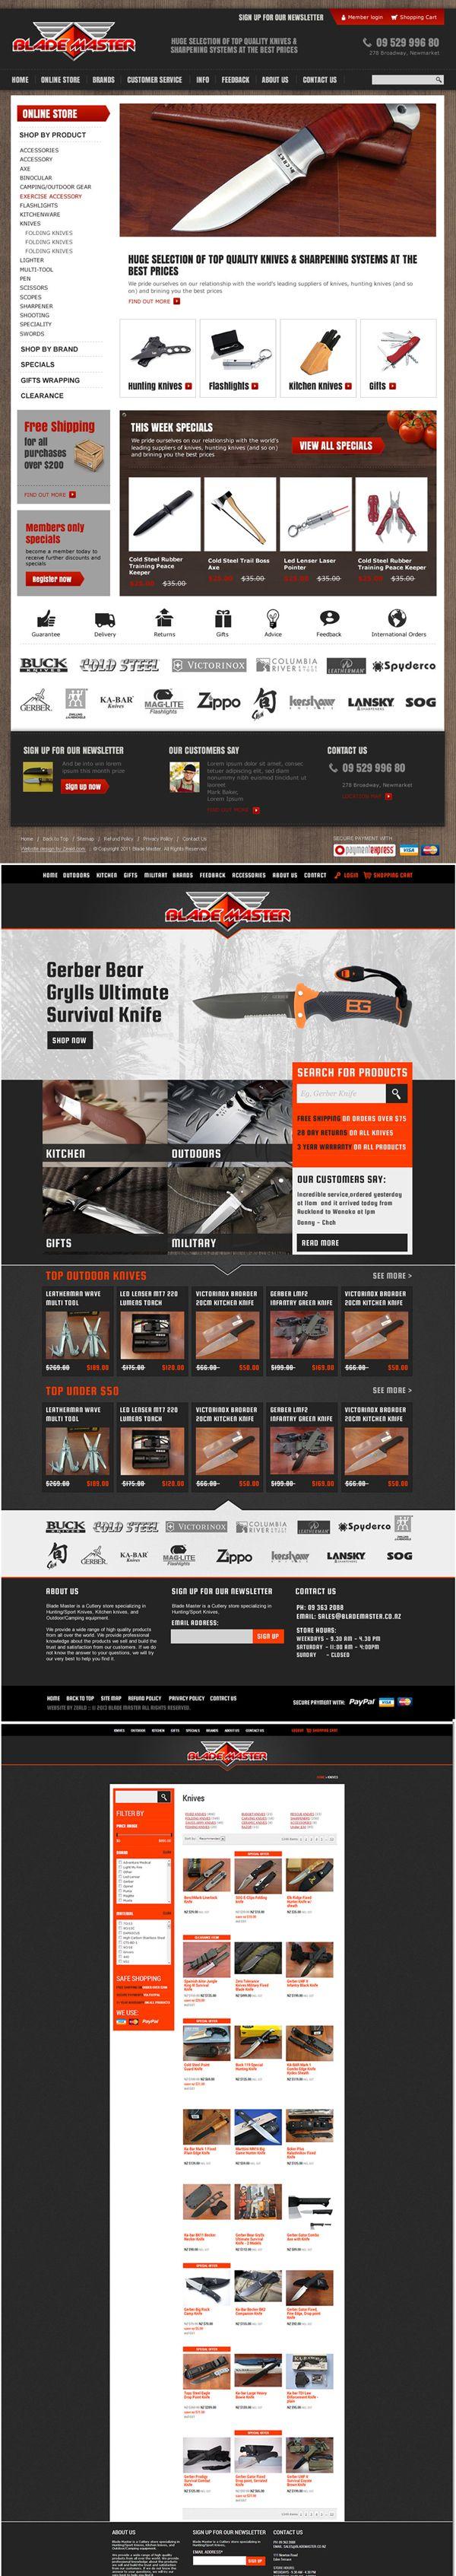 Blade Master website redesign